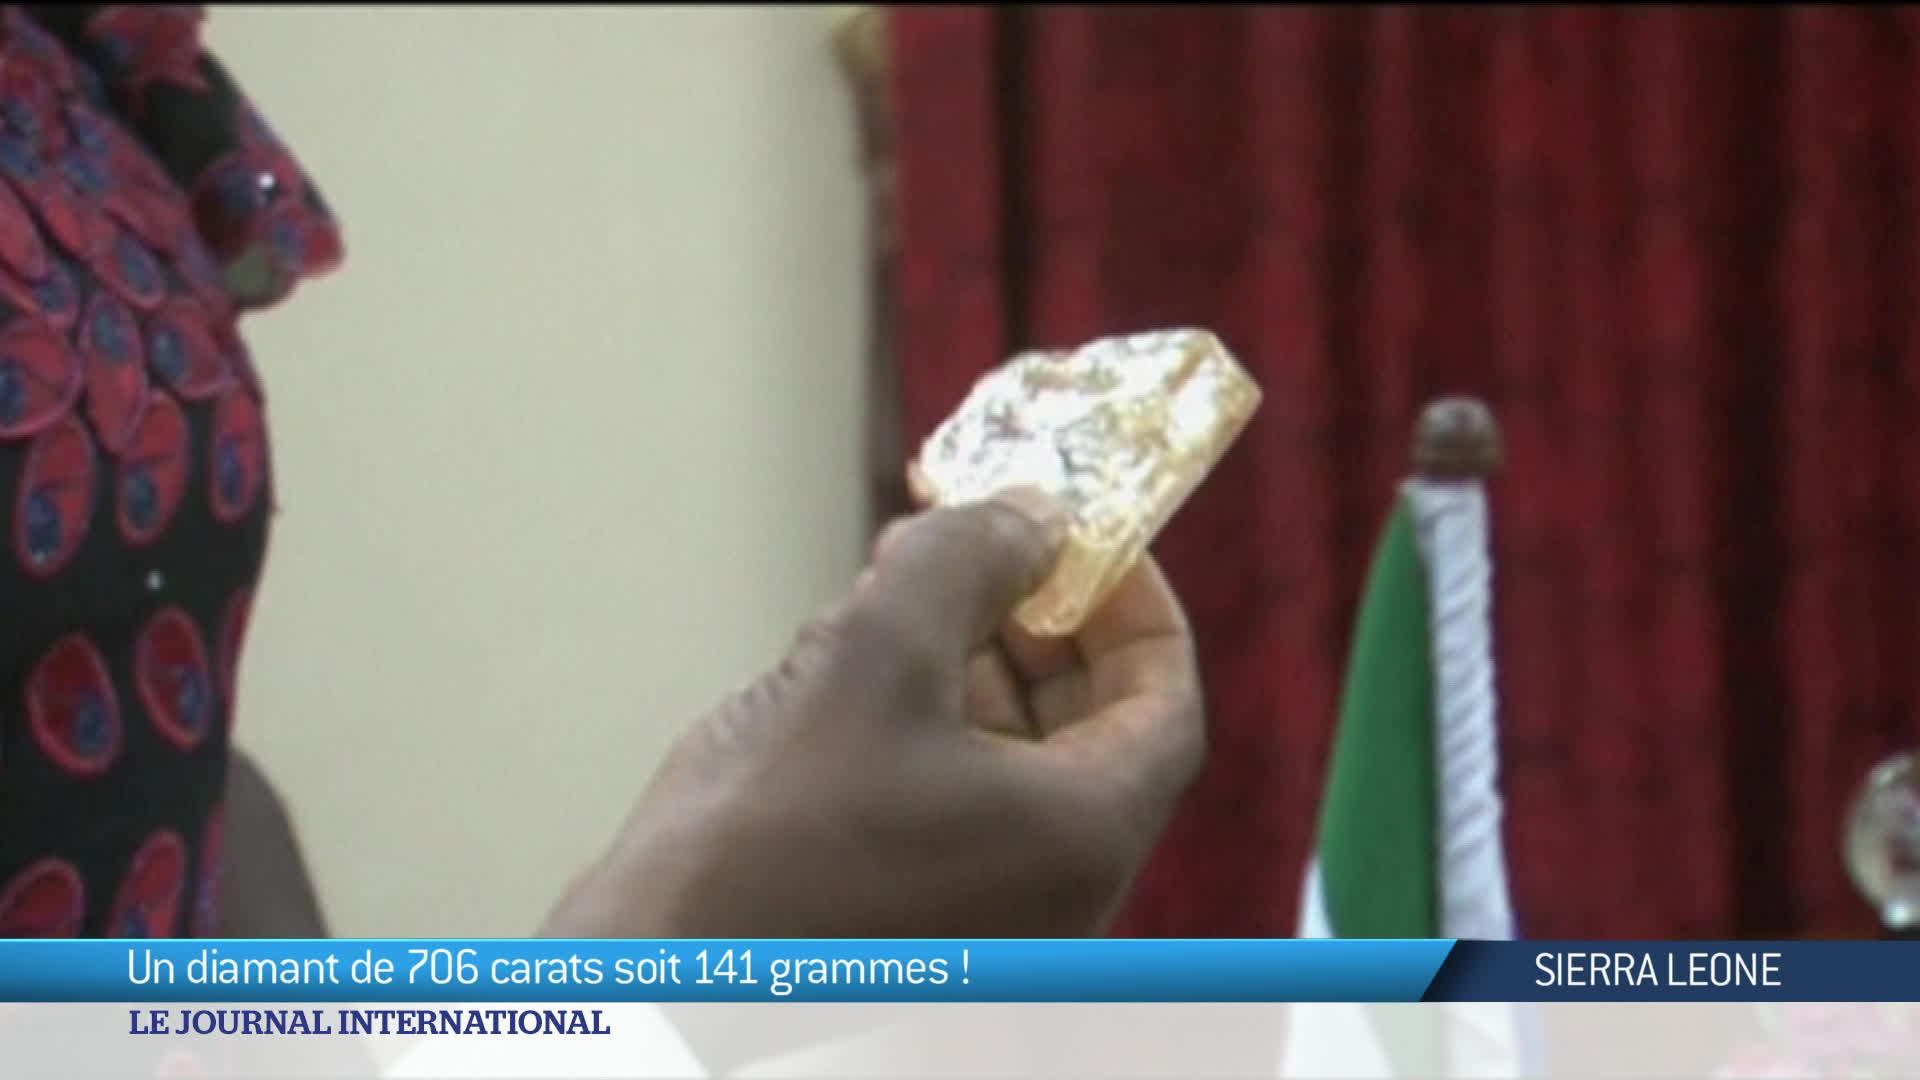 Sierra Leone : le plus gros diamant au monde